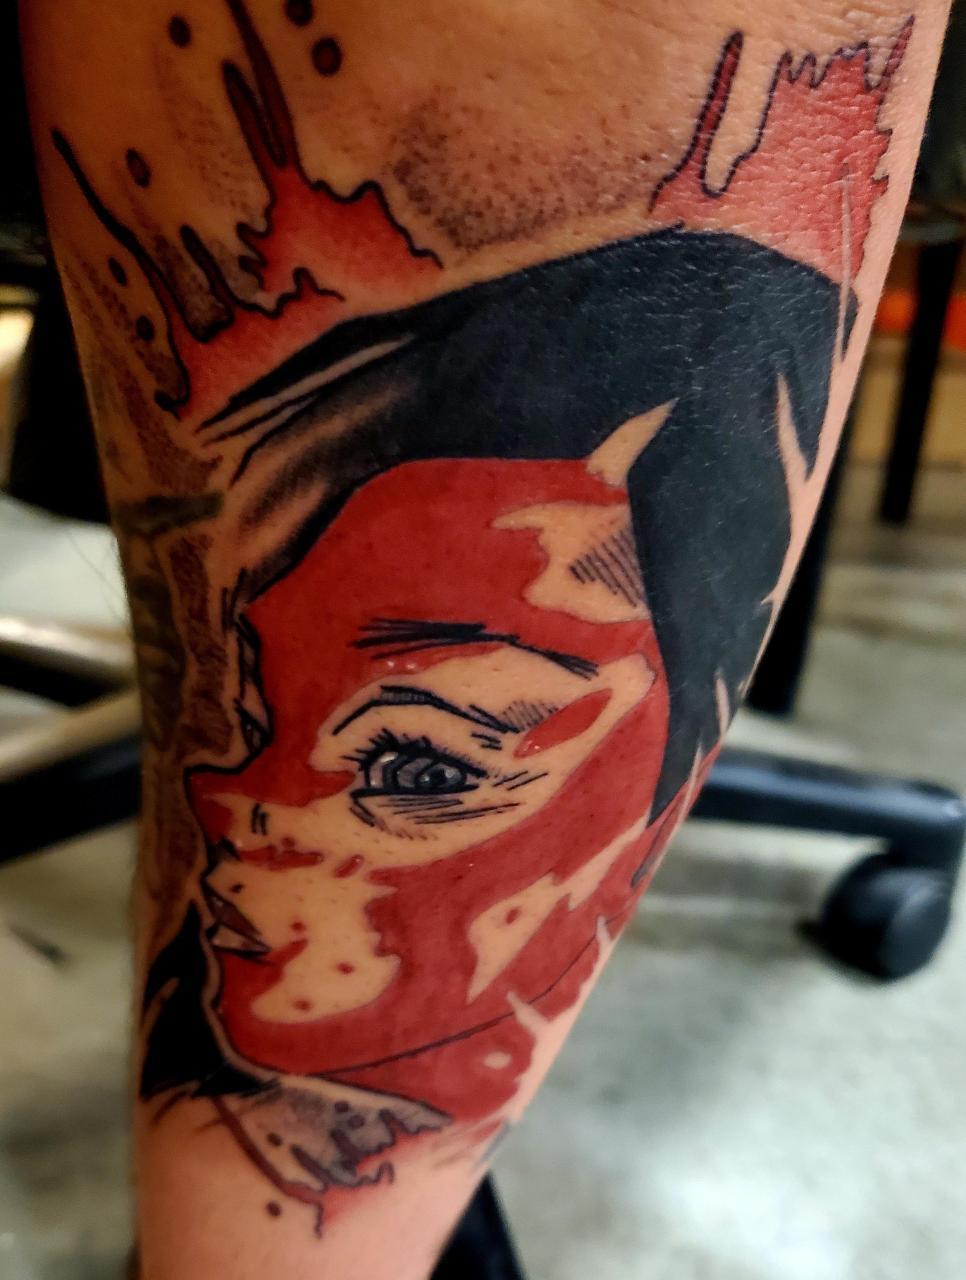 O-Ren Ishii, 2 Days Healed, Done by Cassie Scytha at A Thin Line, Batavia, IL